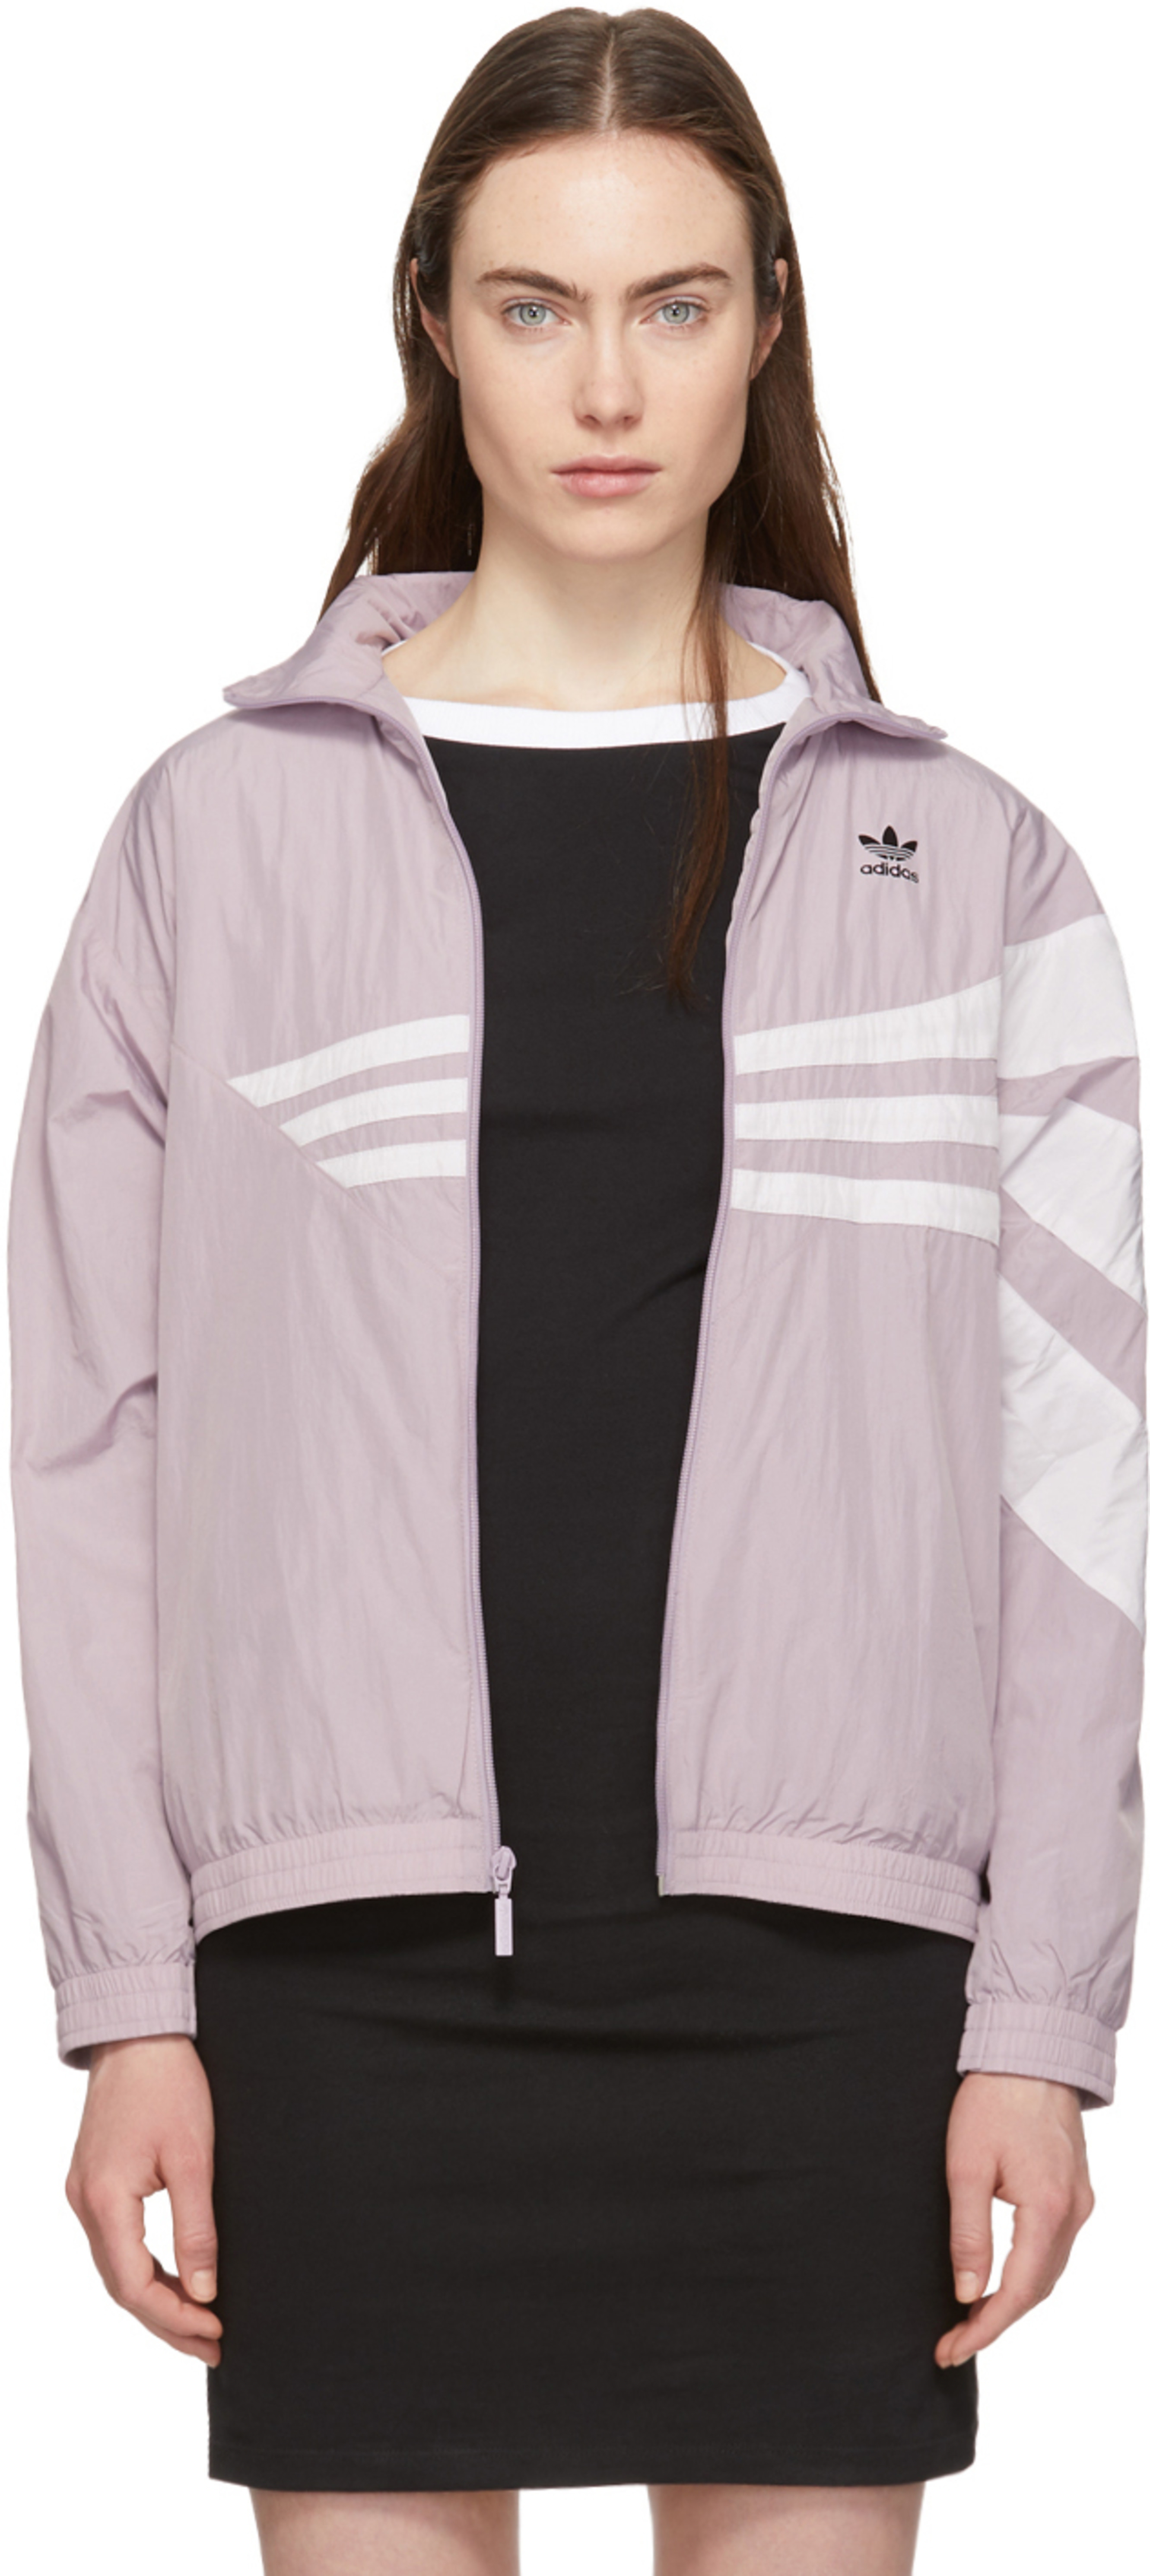 d3bd0a4df0 Adidas Originals for Women SS19 Collection